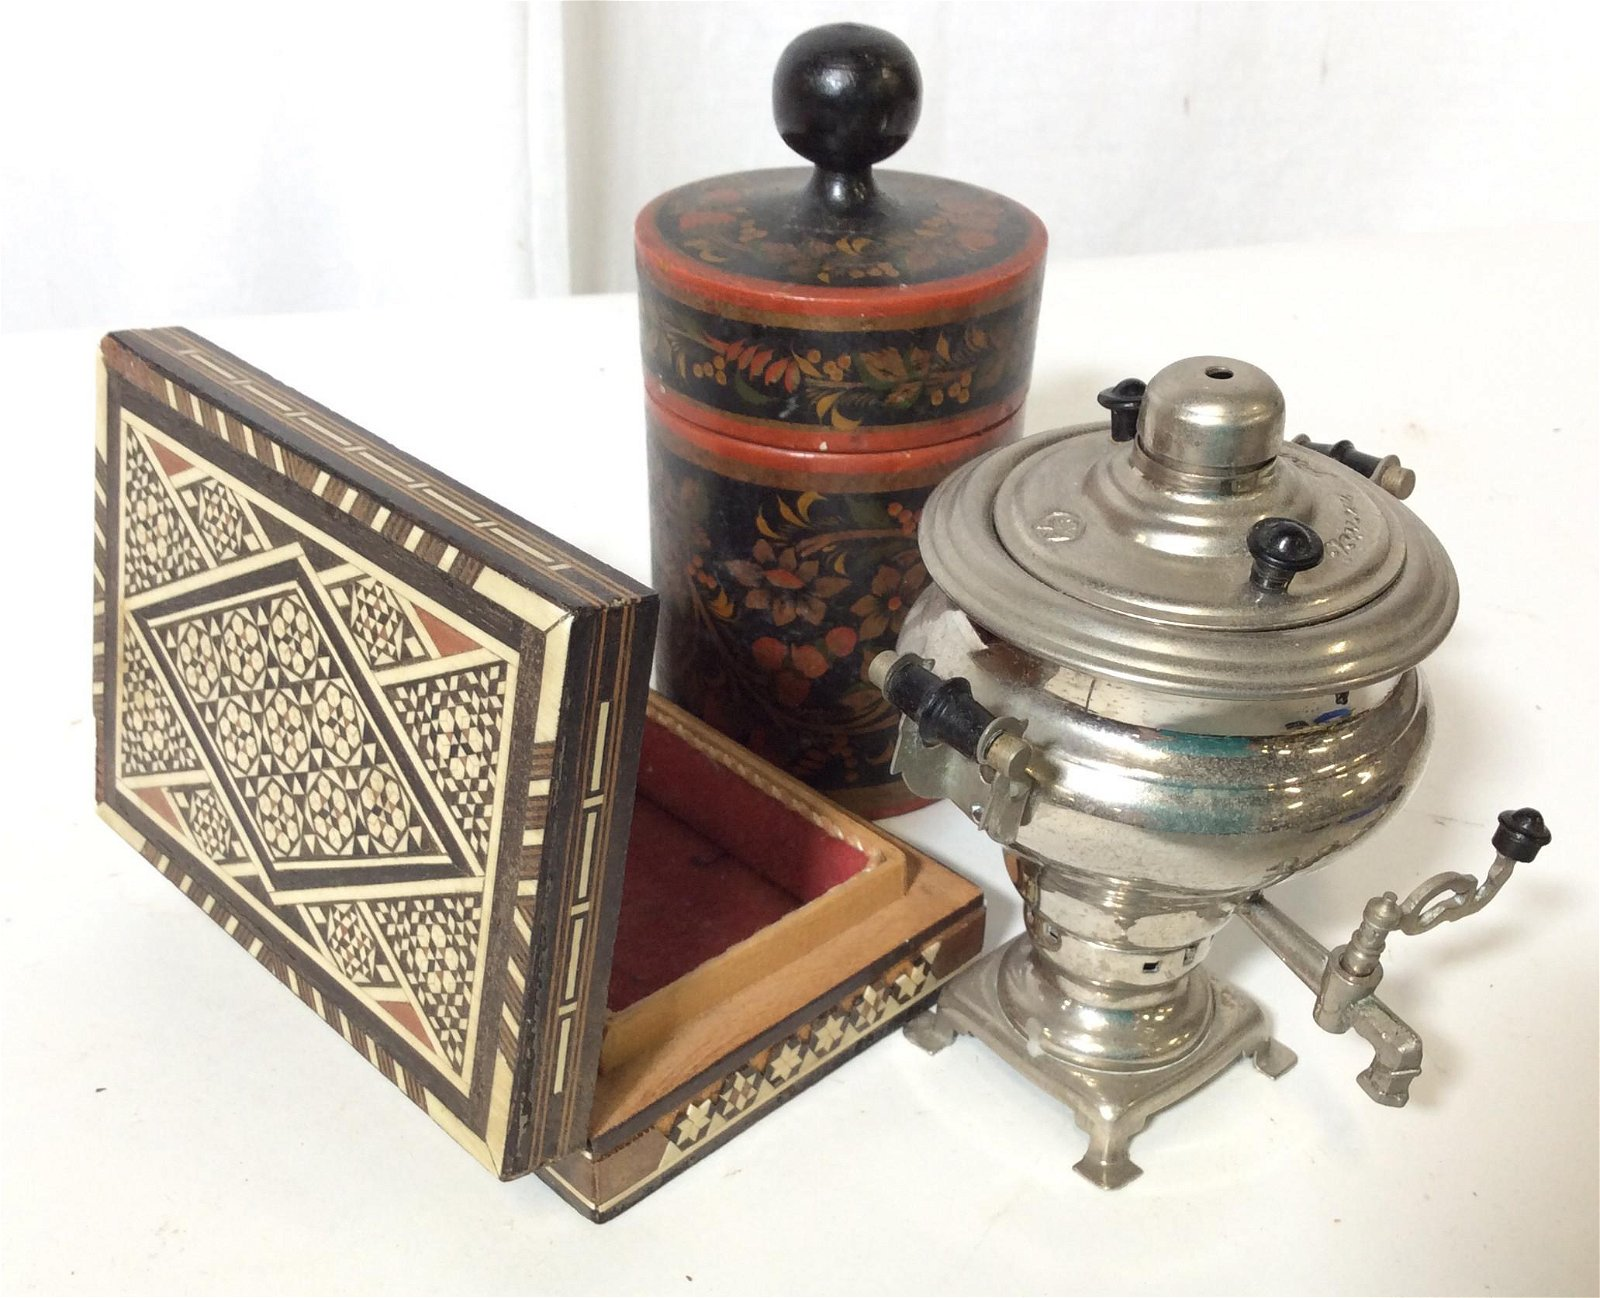 Decorative Vintage Russian Tabletop Decor